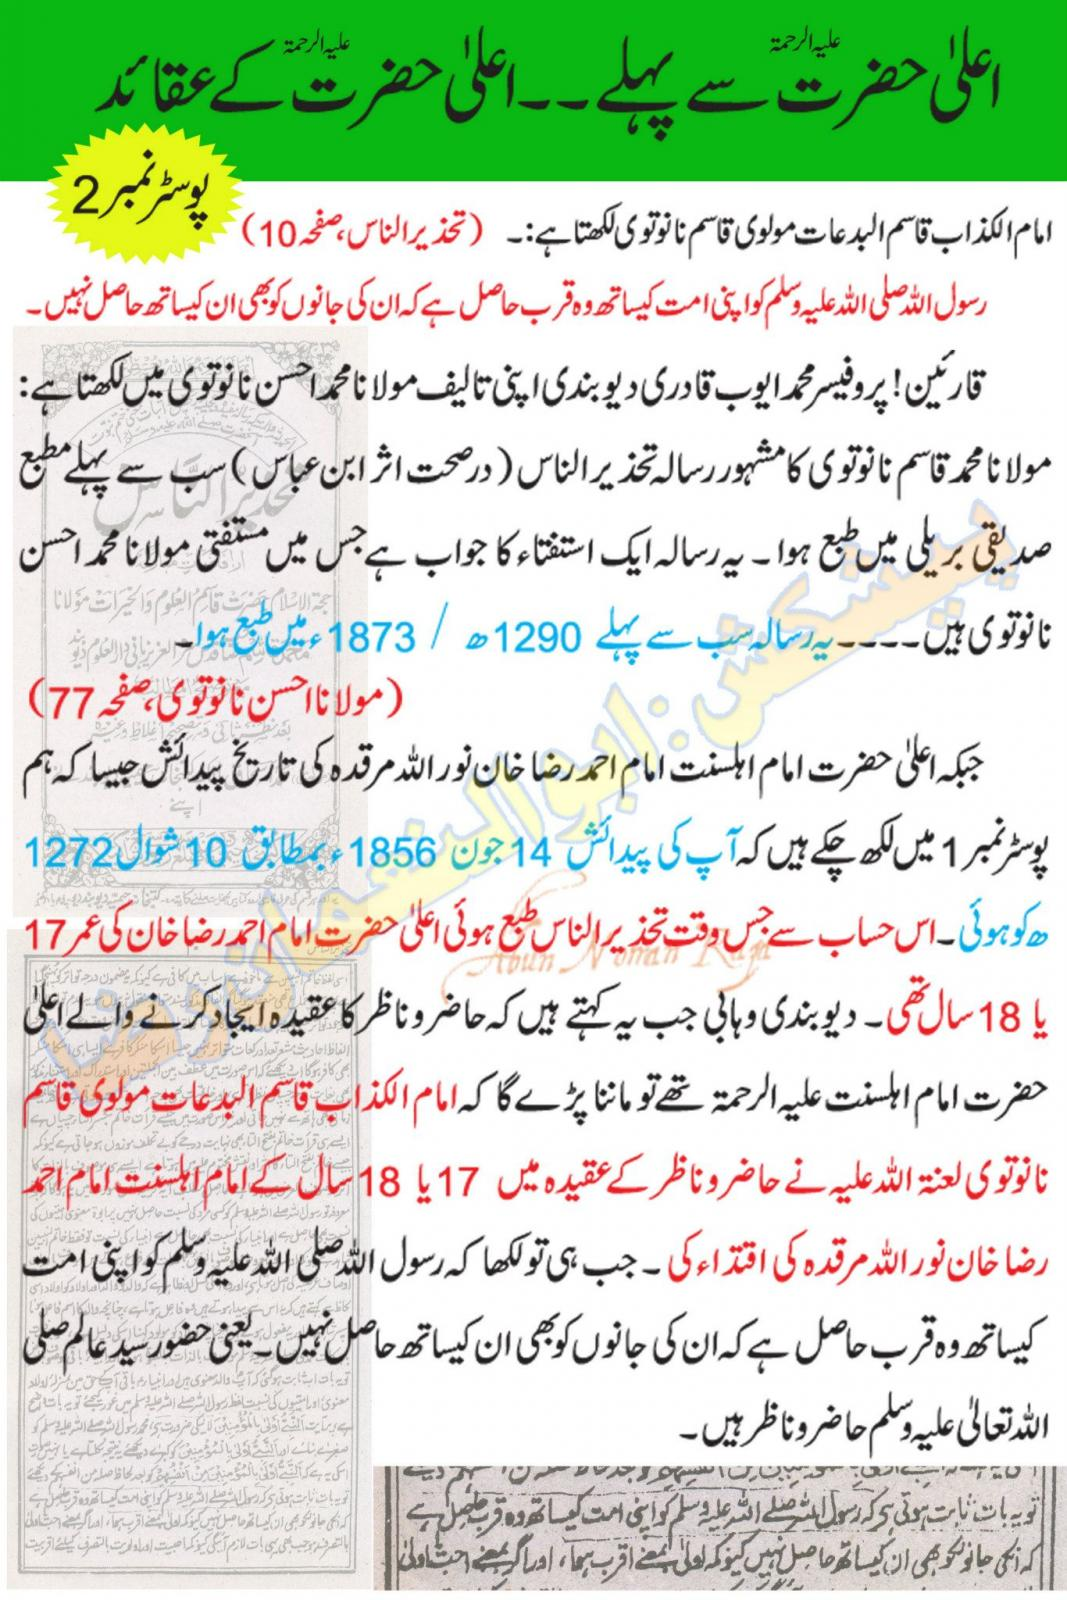 Ala Hazrat (1).jpg